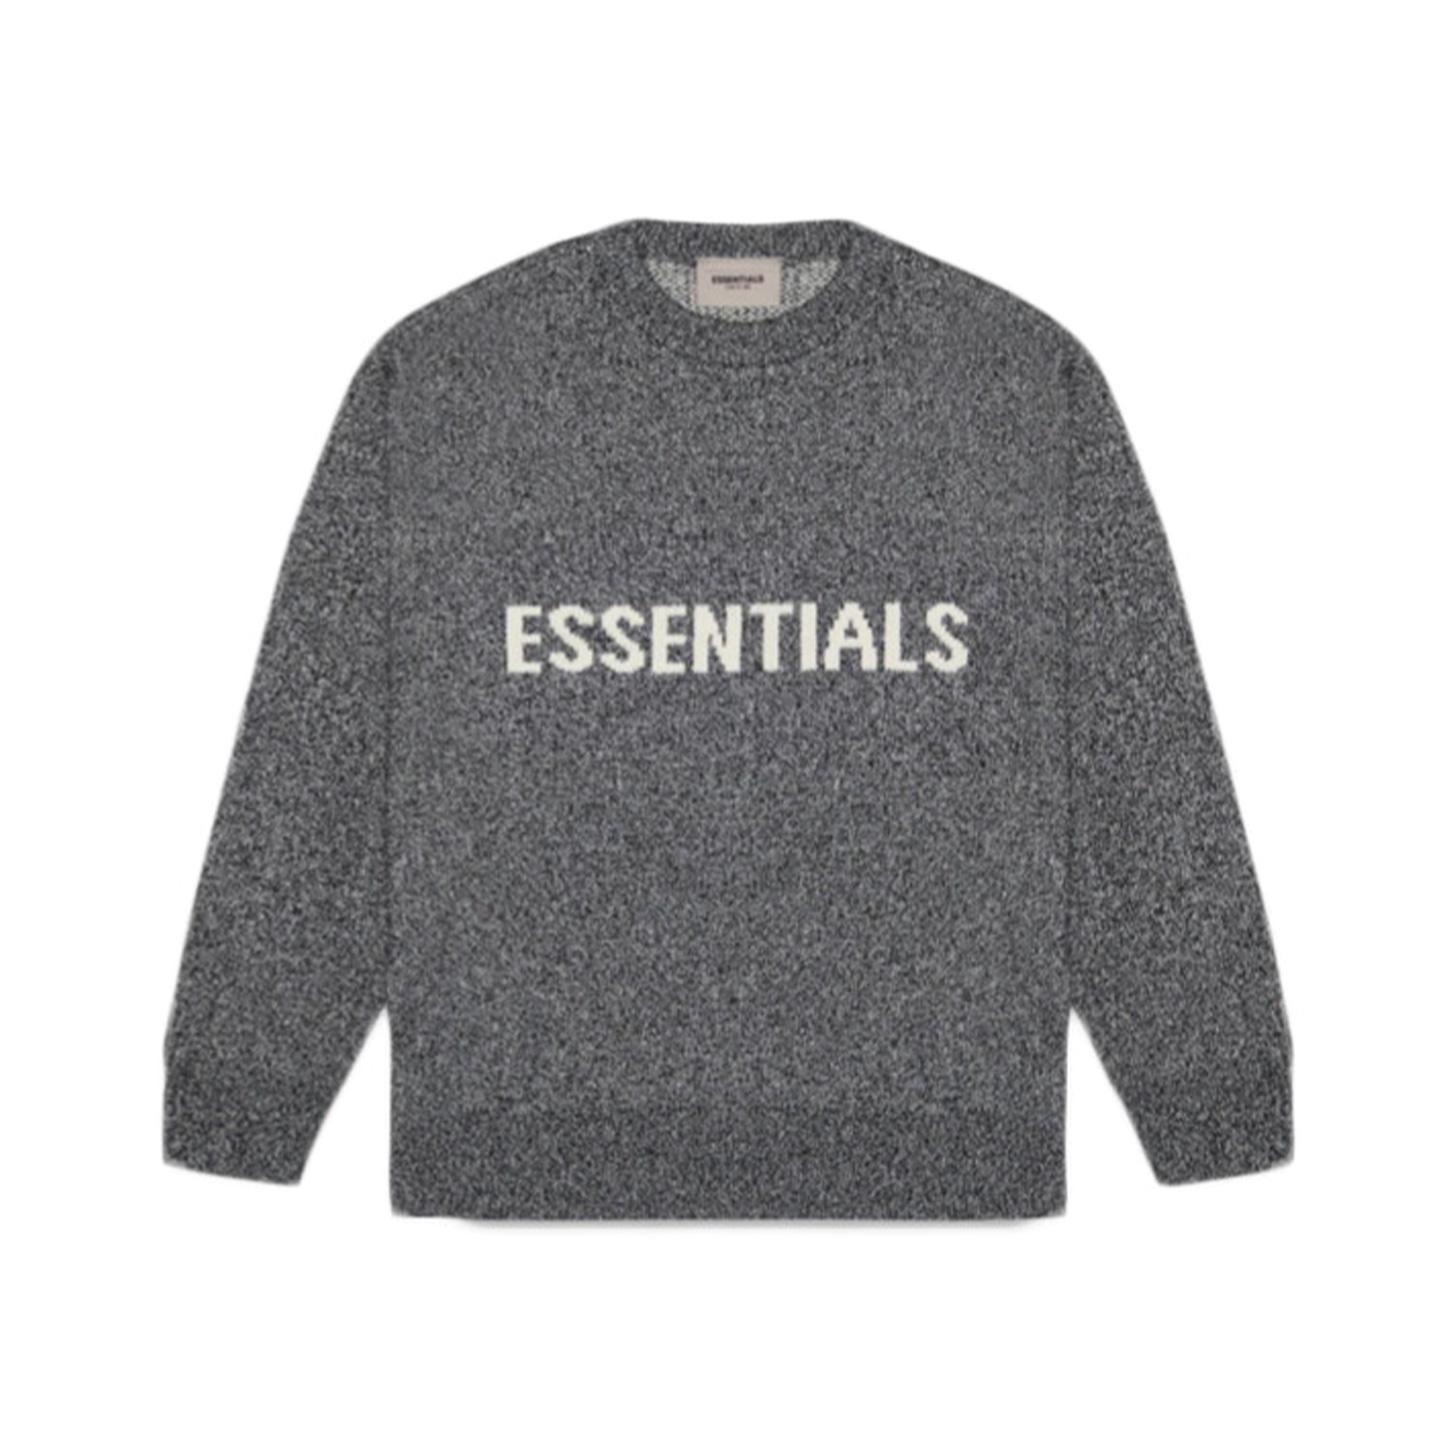 FEAR OF GOD ESSENTIALS Knit Sweater Dark Slate/Stretch Limo/Black 20SS